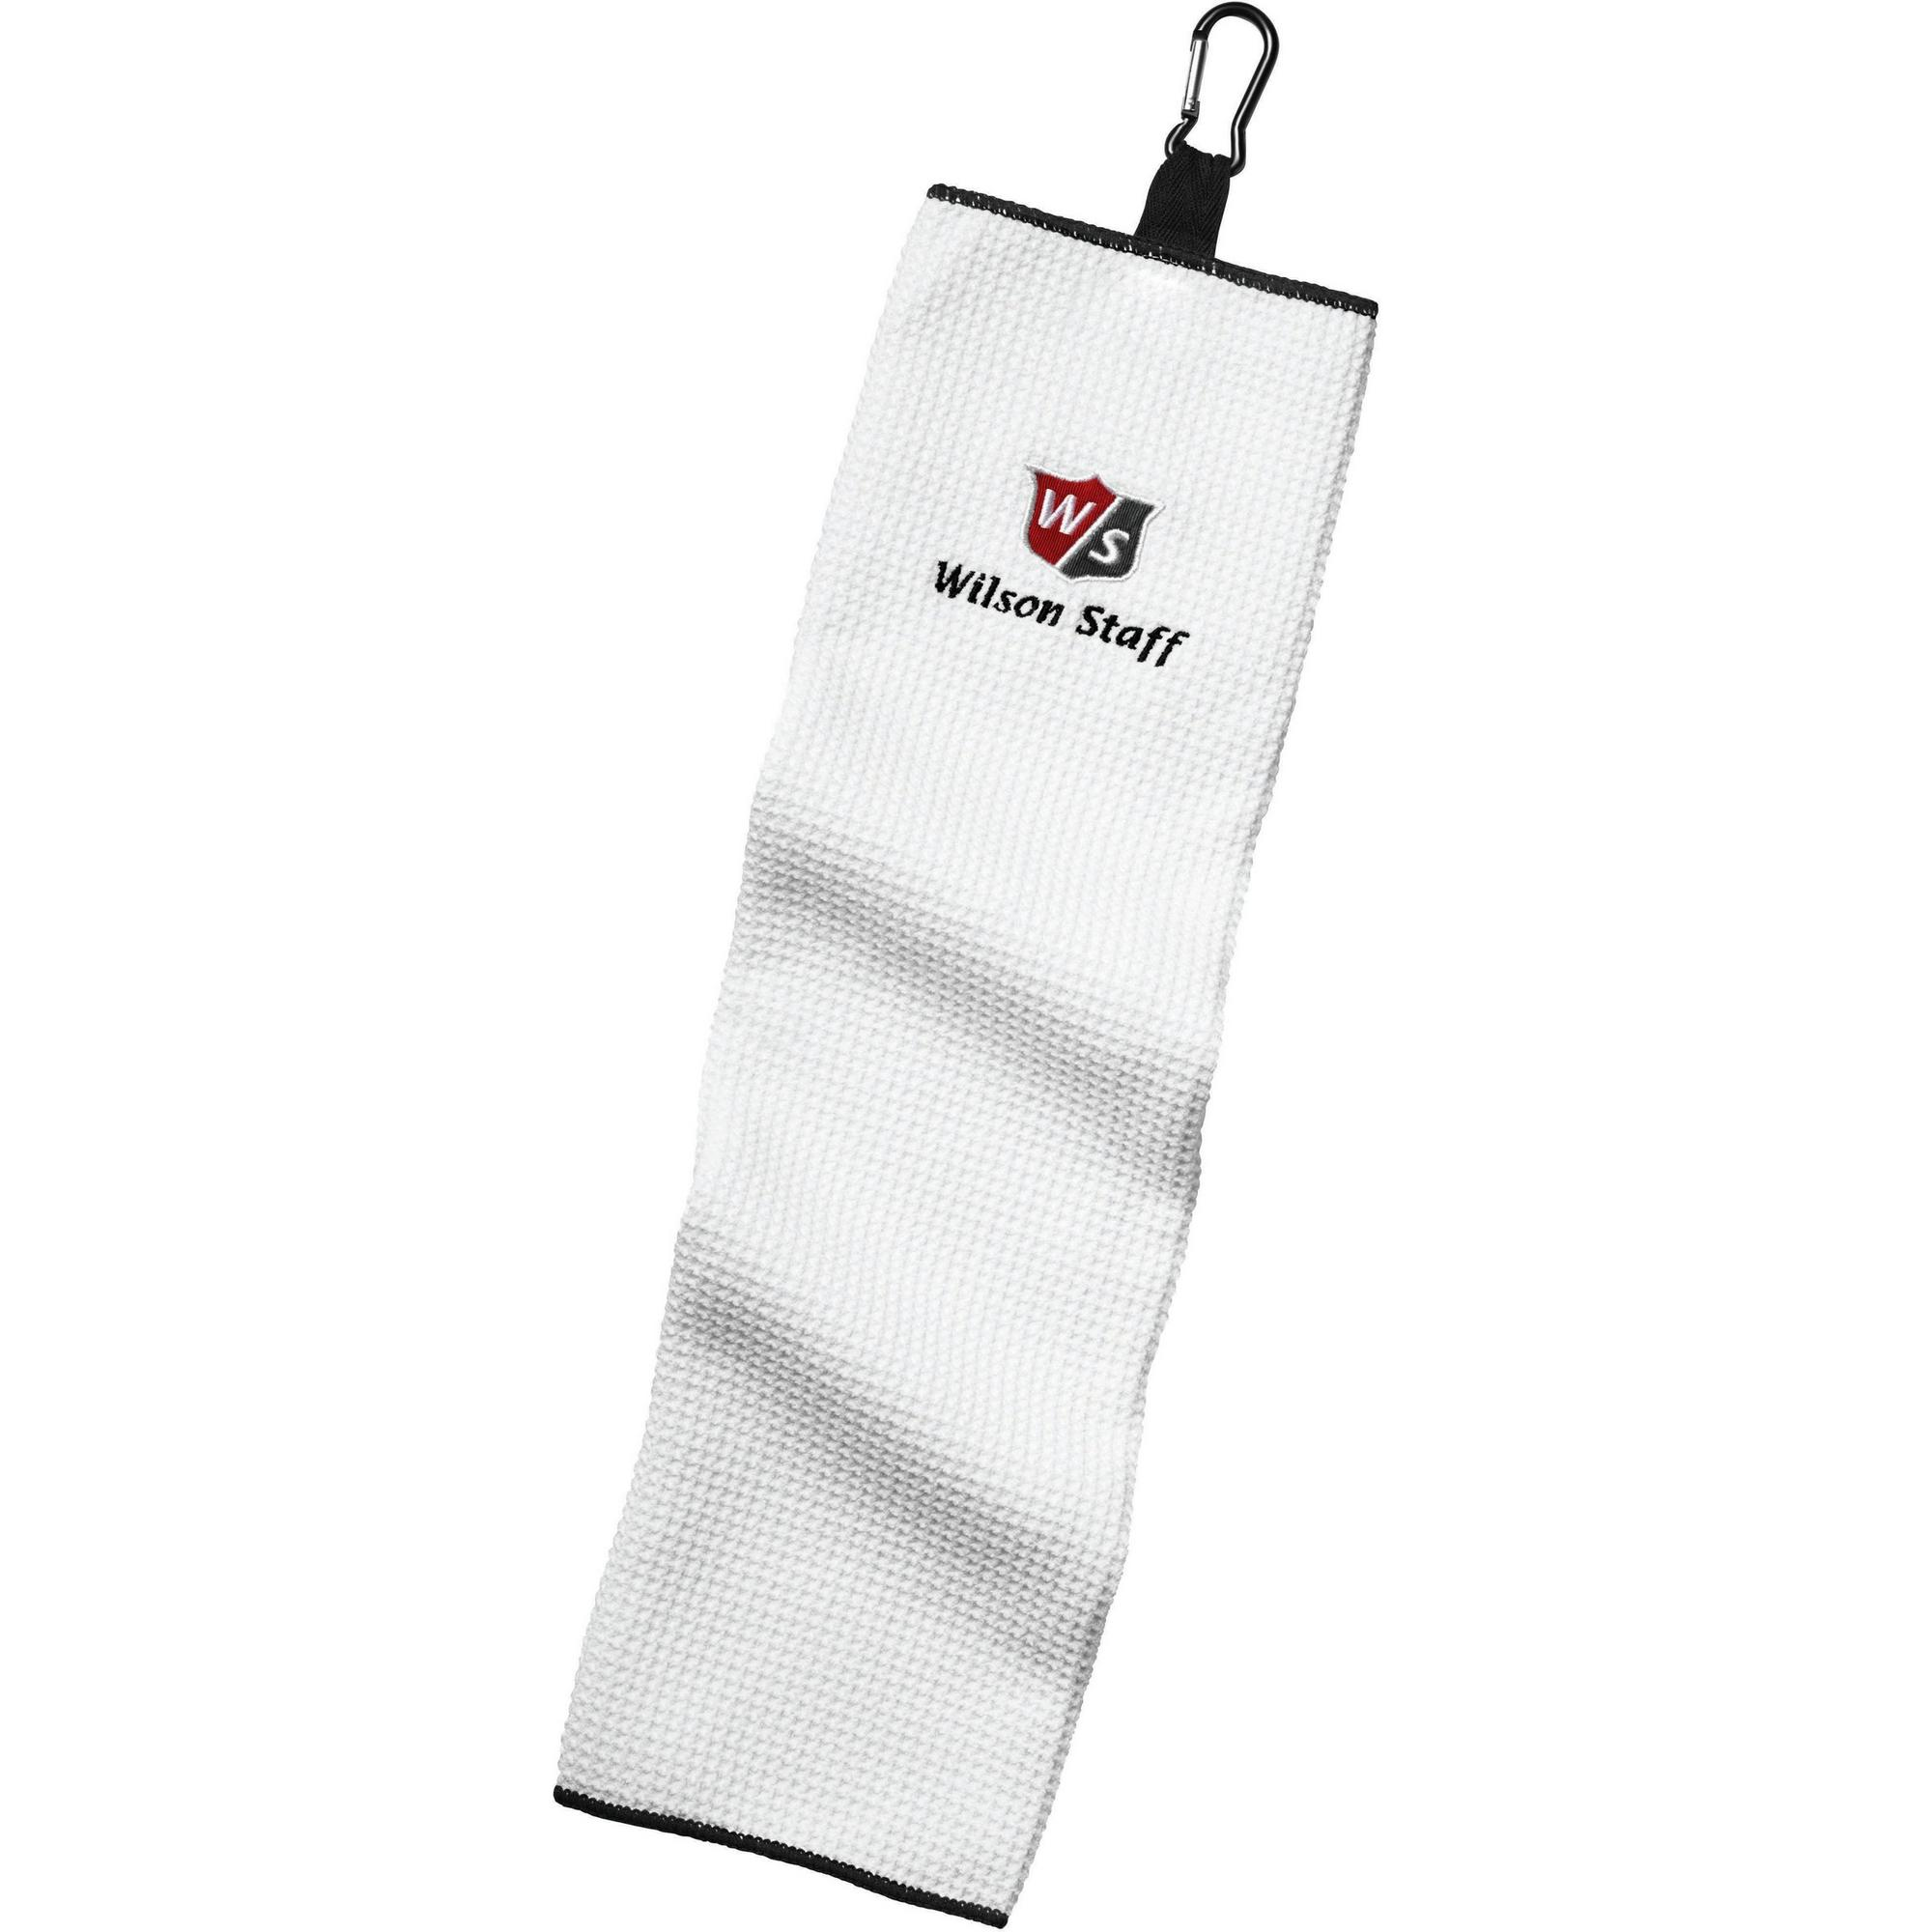 Microfiber Trifold Towel - White